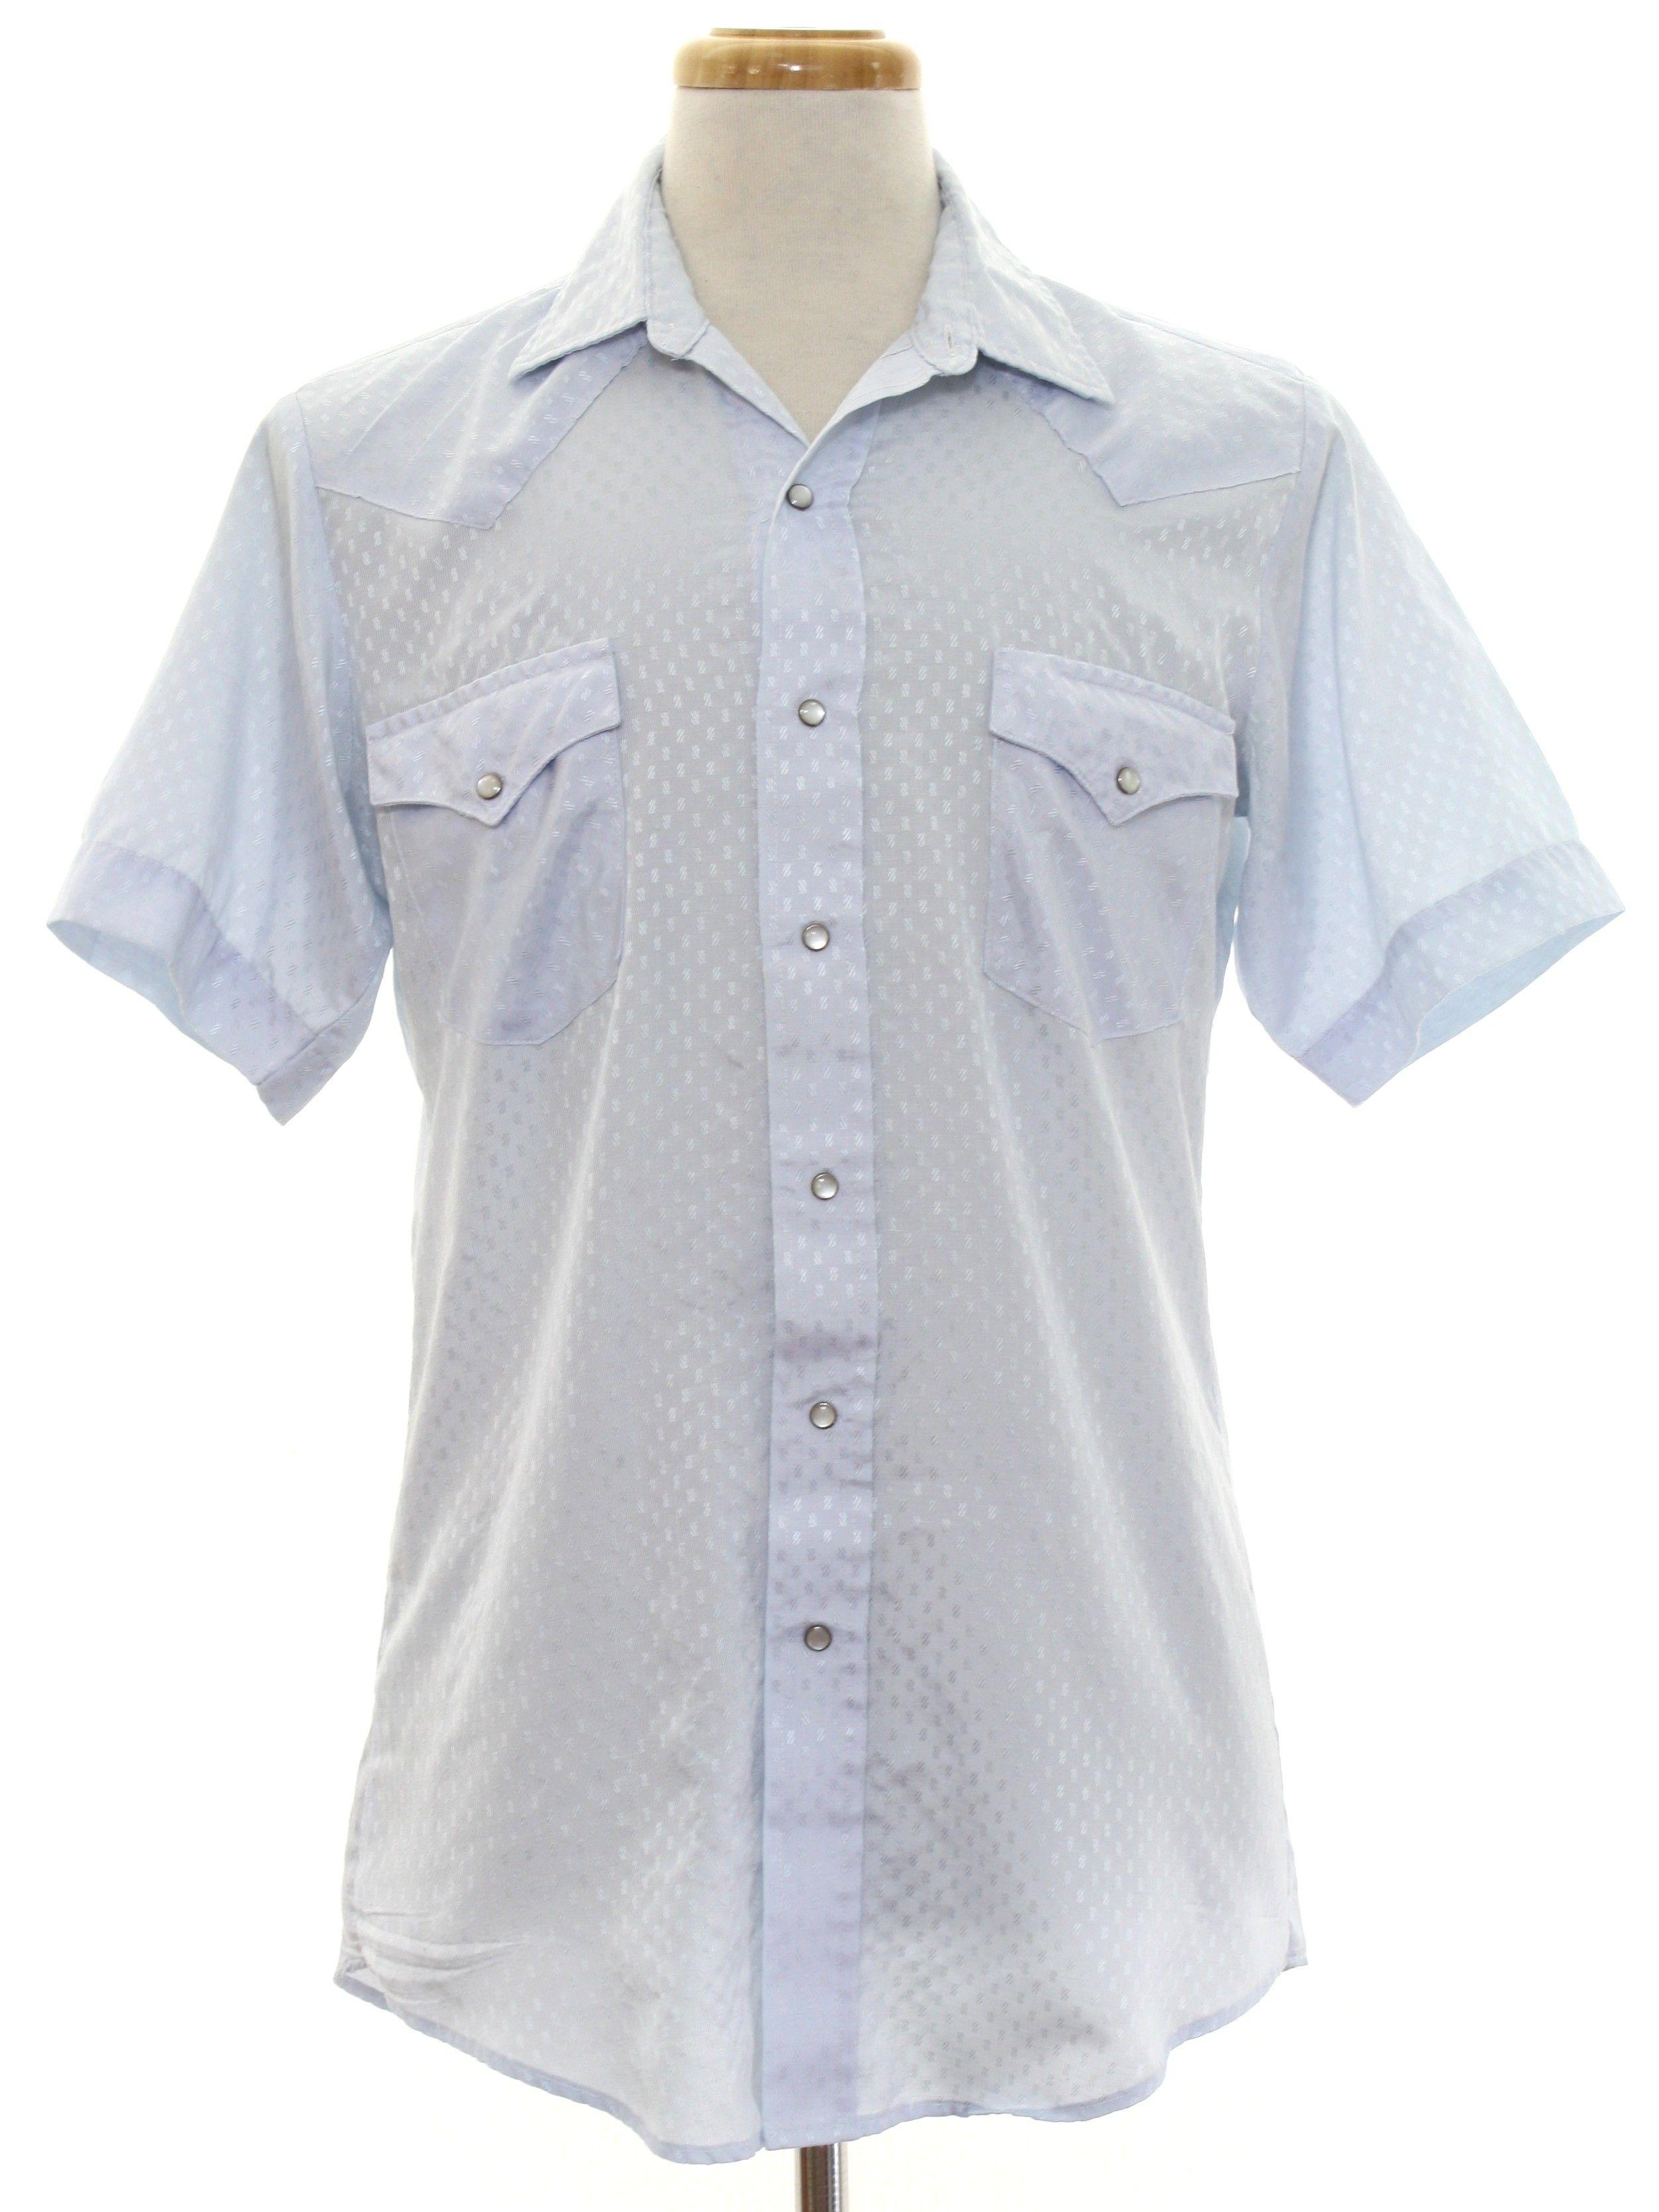 facb3ccaec3413 Rectangle Shape, Western Shirts, Hemline, Chef Jackets, Overalls, Men  Casual,